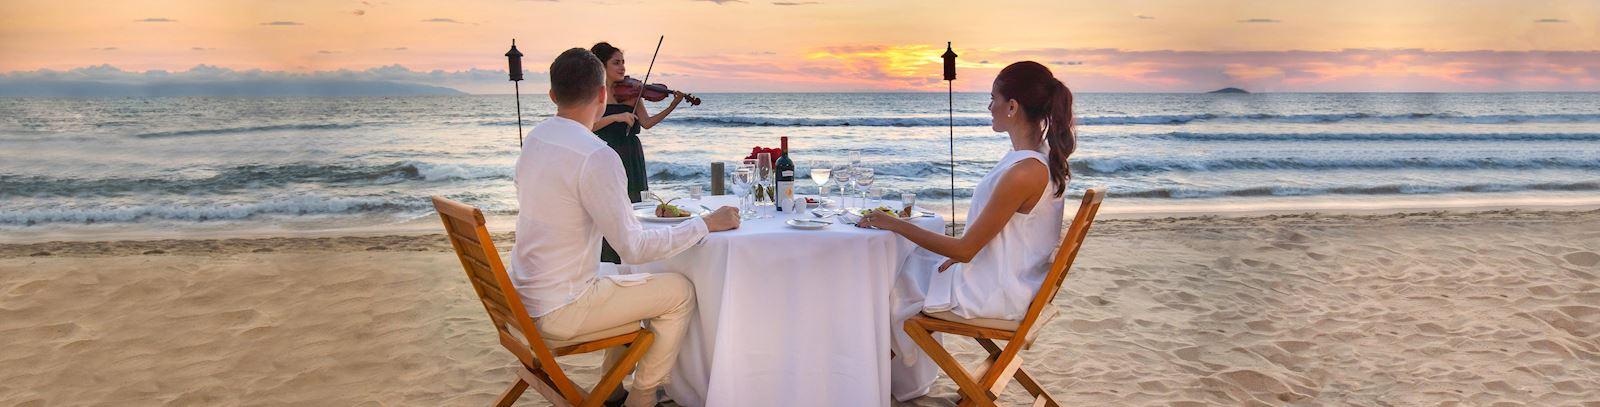 Dinner Under the Stars Package - Grand Velas Riviera Nayarit